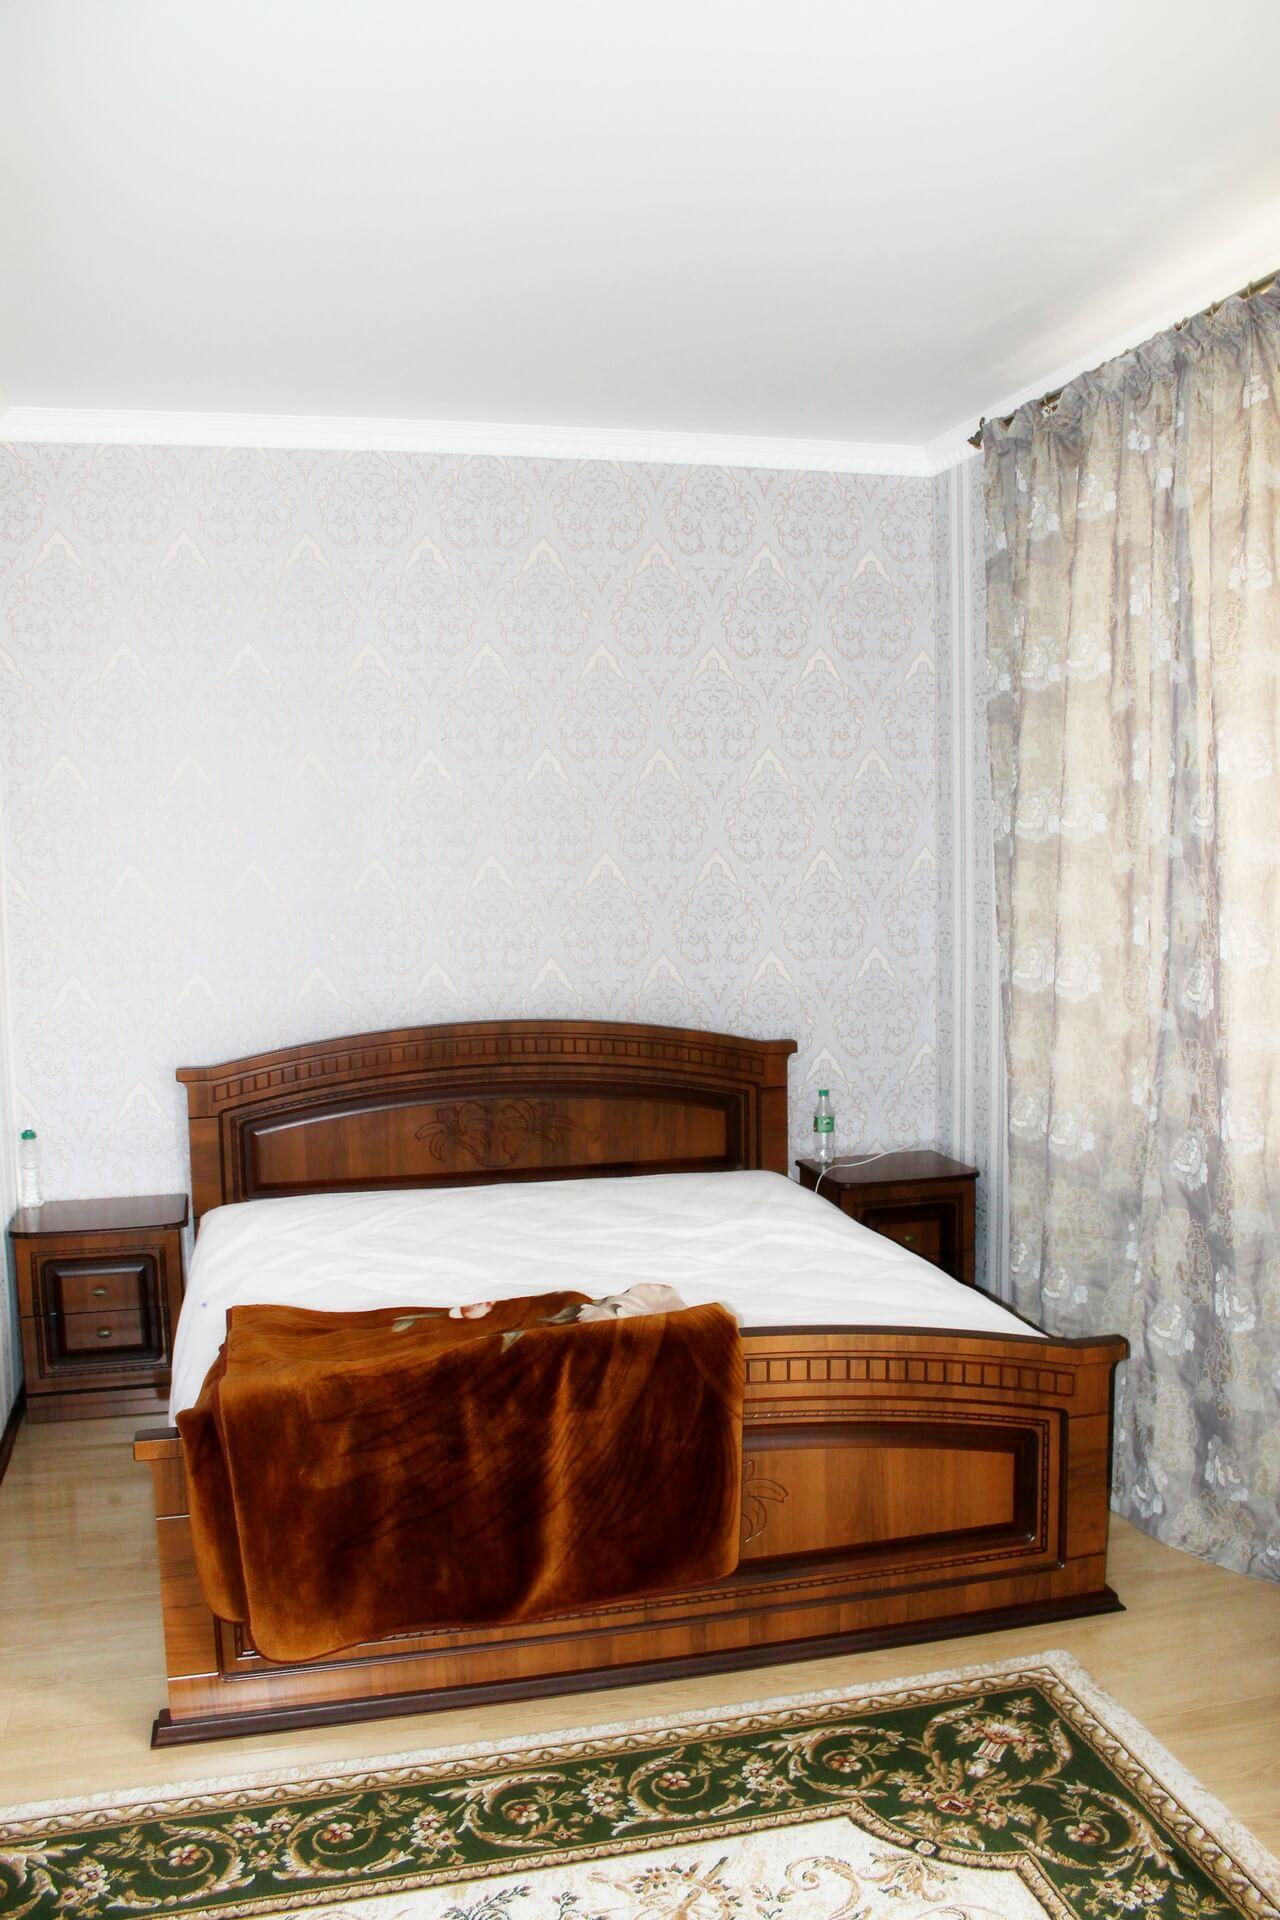 Гостевой дом на улице Веселая - image Gostevoj-dom-v-Adlere-5 on http://bizneskvartal.ru